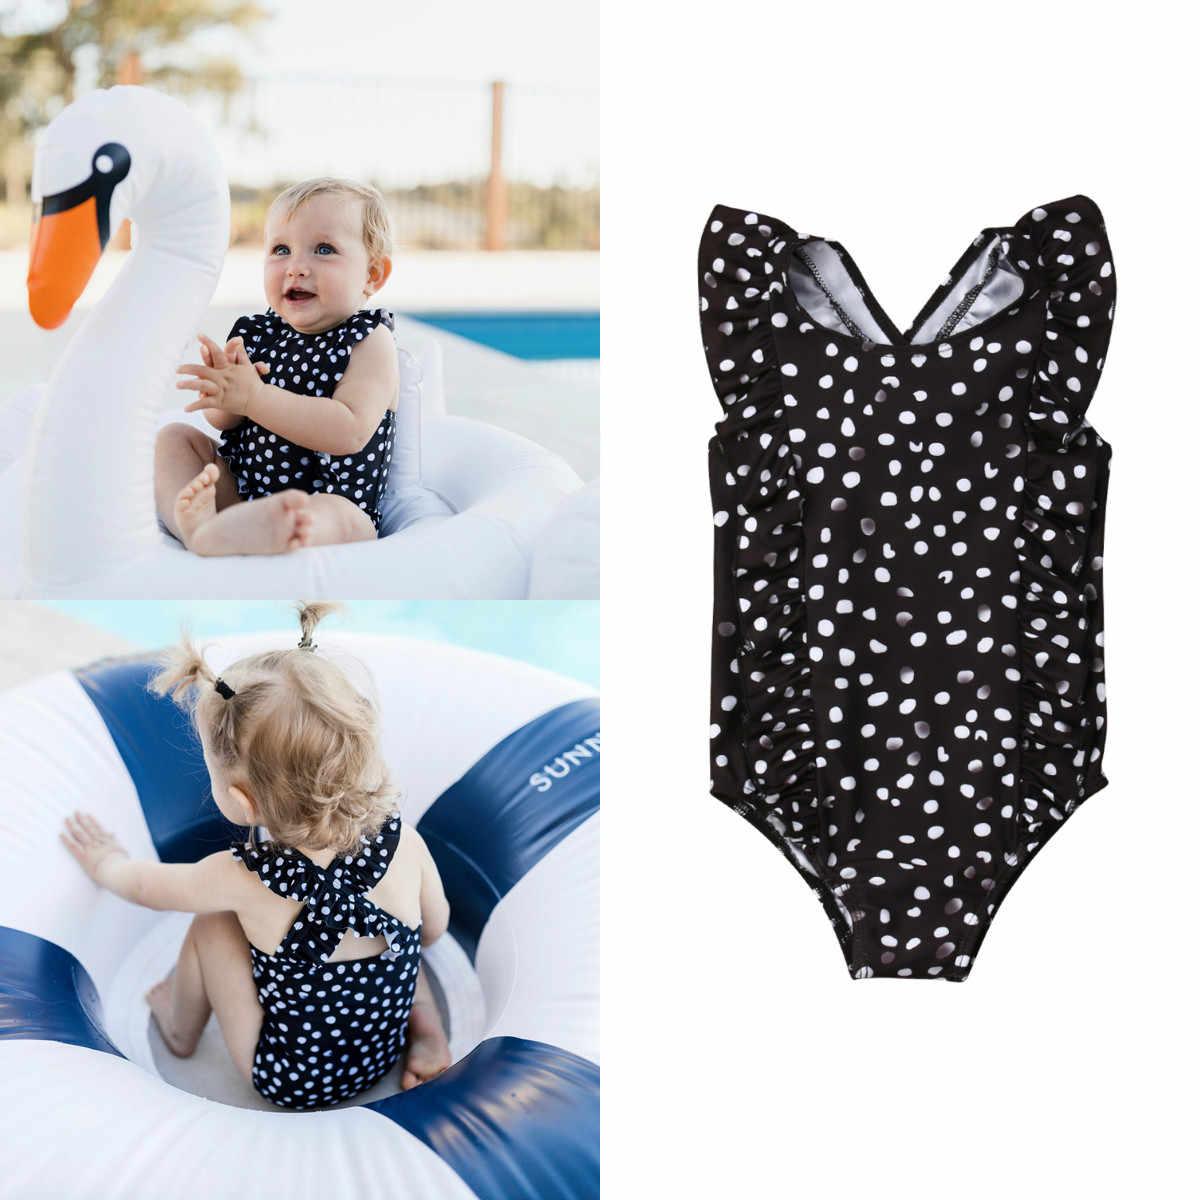 4217ebcc516 1-6Y Toddler Kids Baby Girls Ruffles Dot Swimwear Bikini Swimsuit Bathing  Suit 2019 Summer